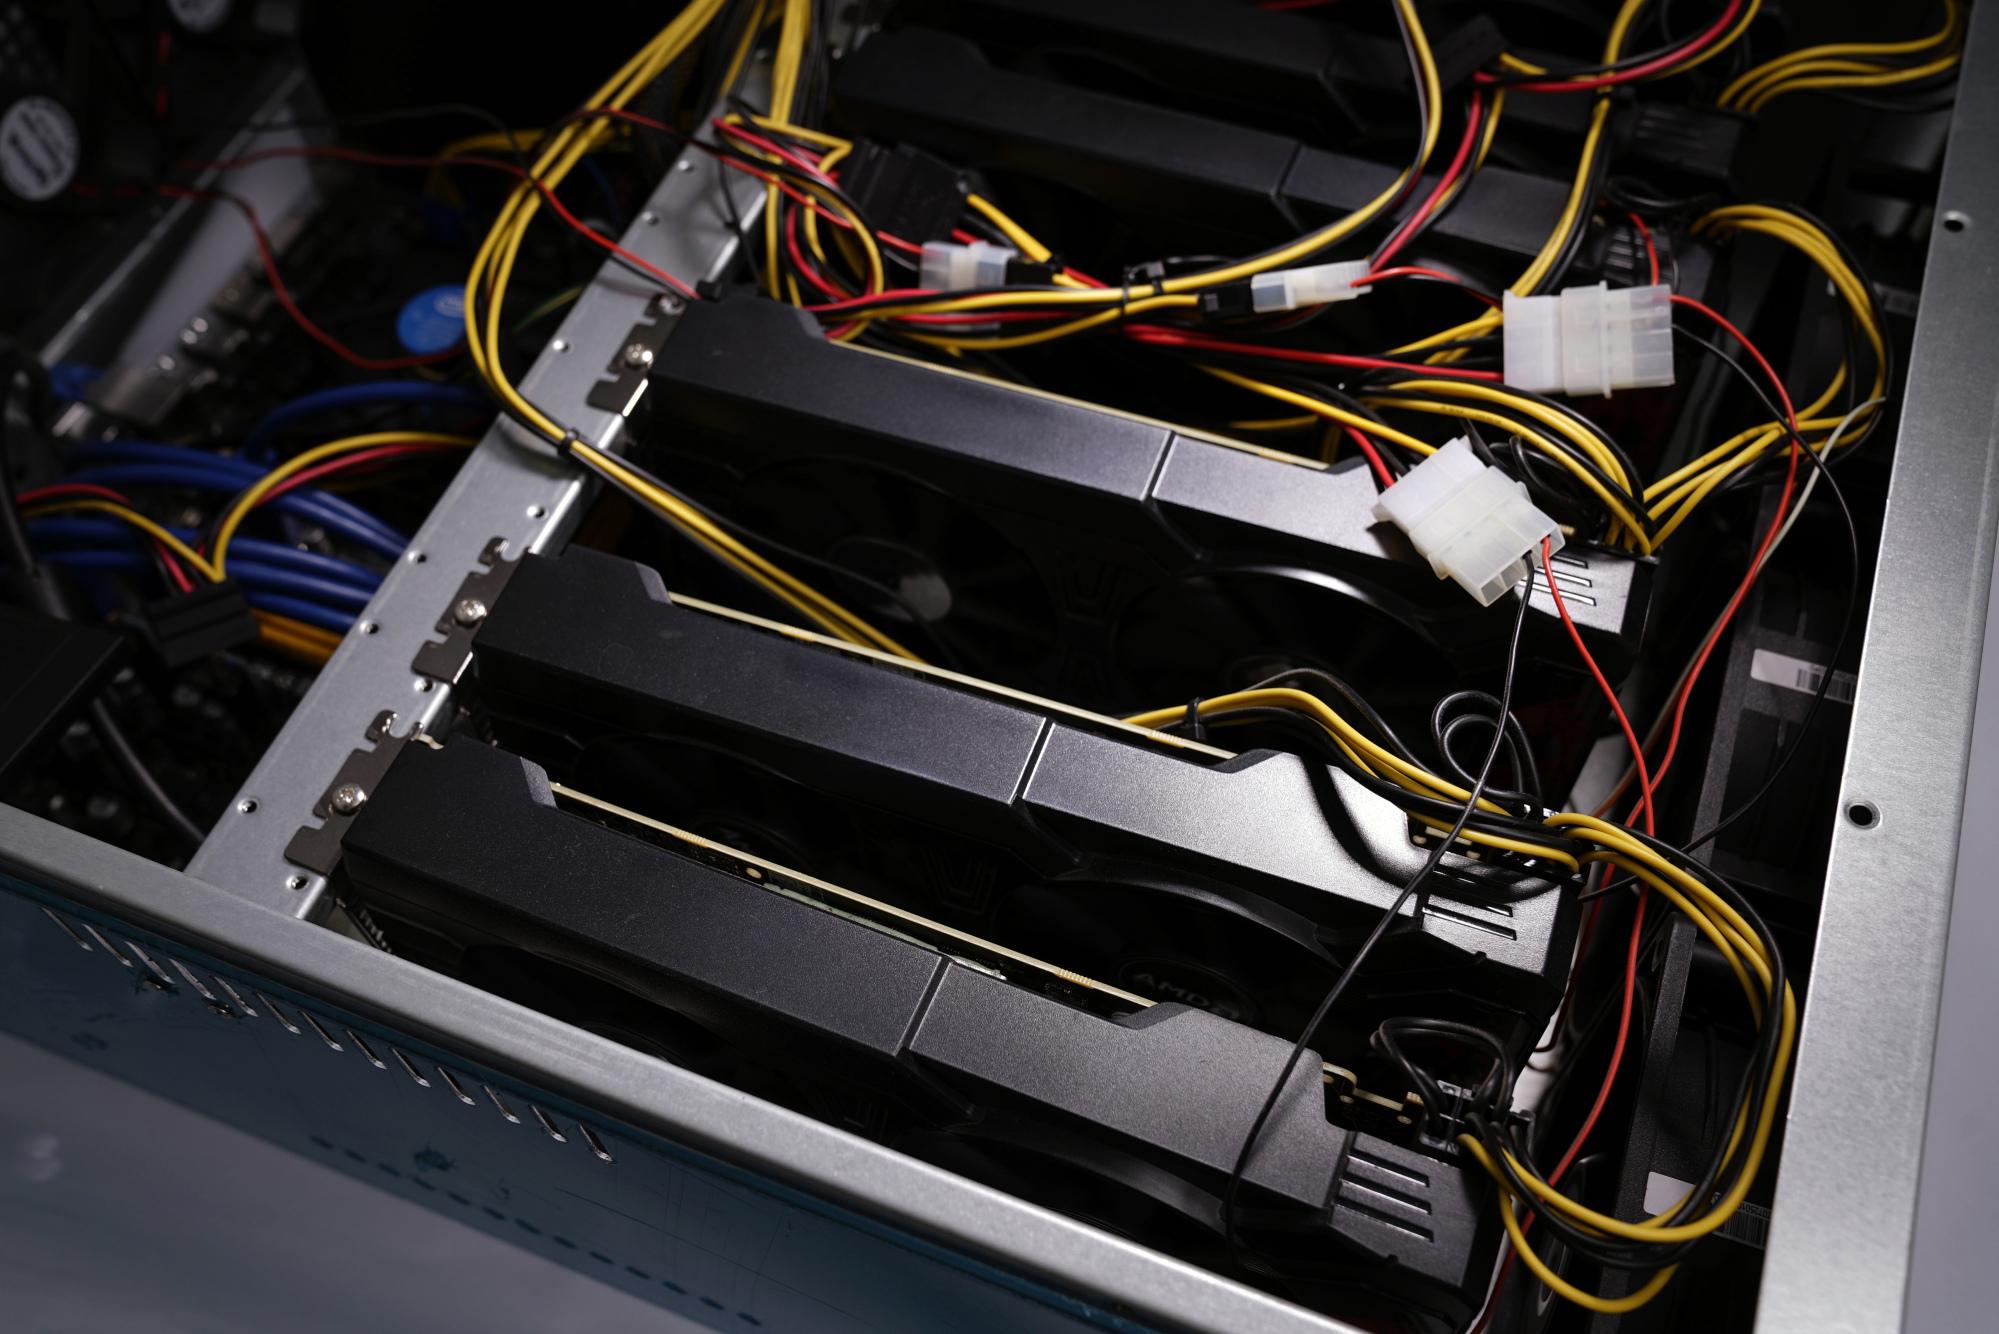 Nigerian Senate Orders Investigation of Bitcoin Trading - Bloomberg